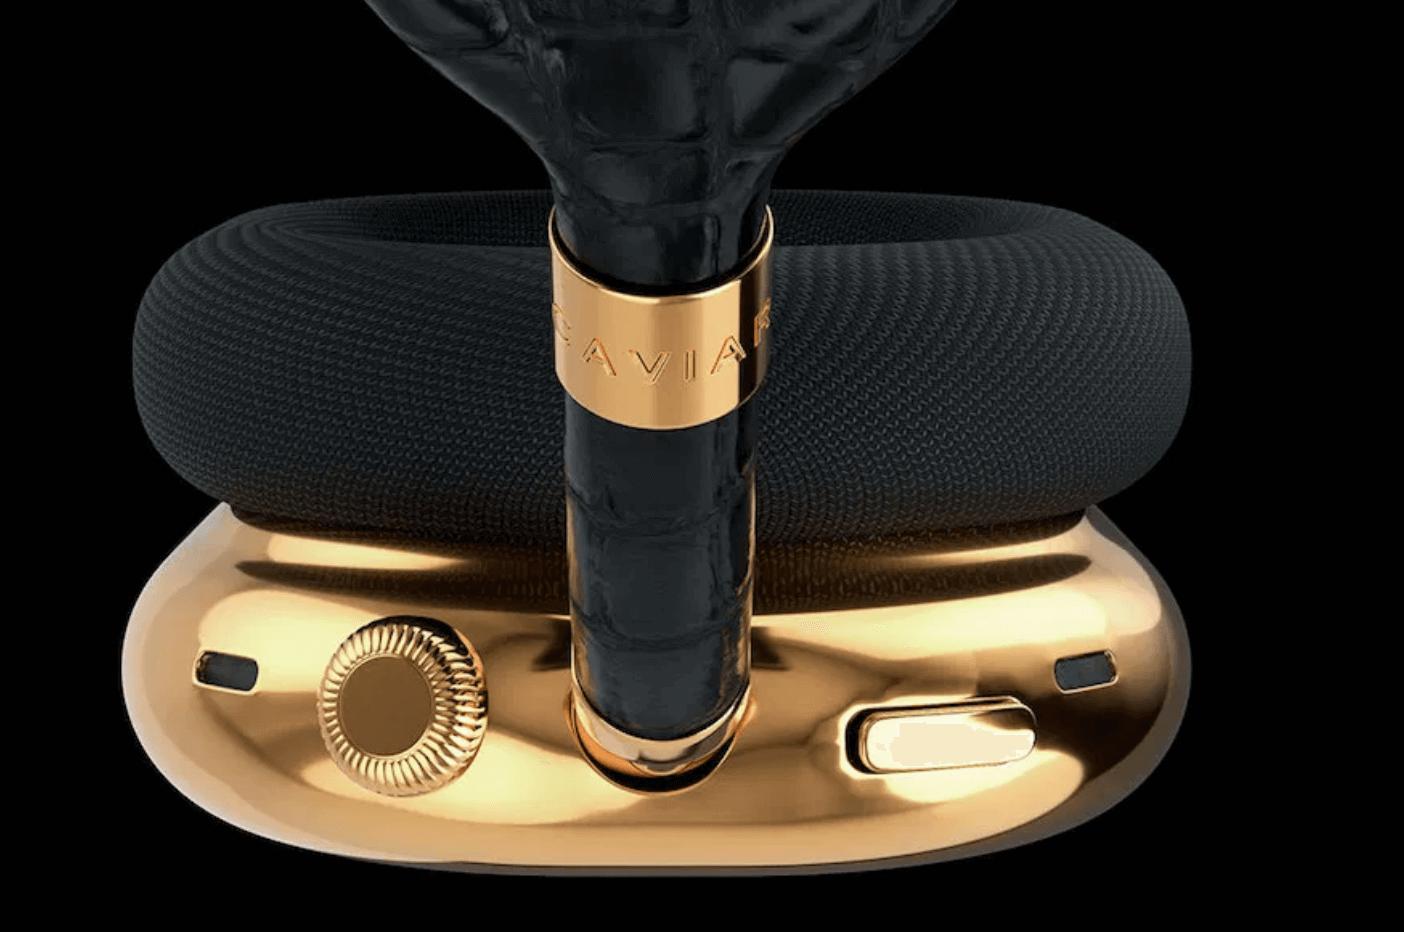 Caviar Airpods Max bilgi